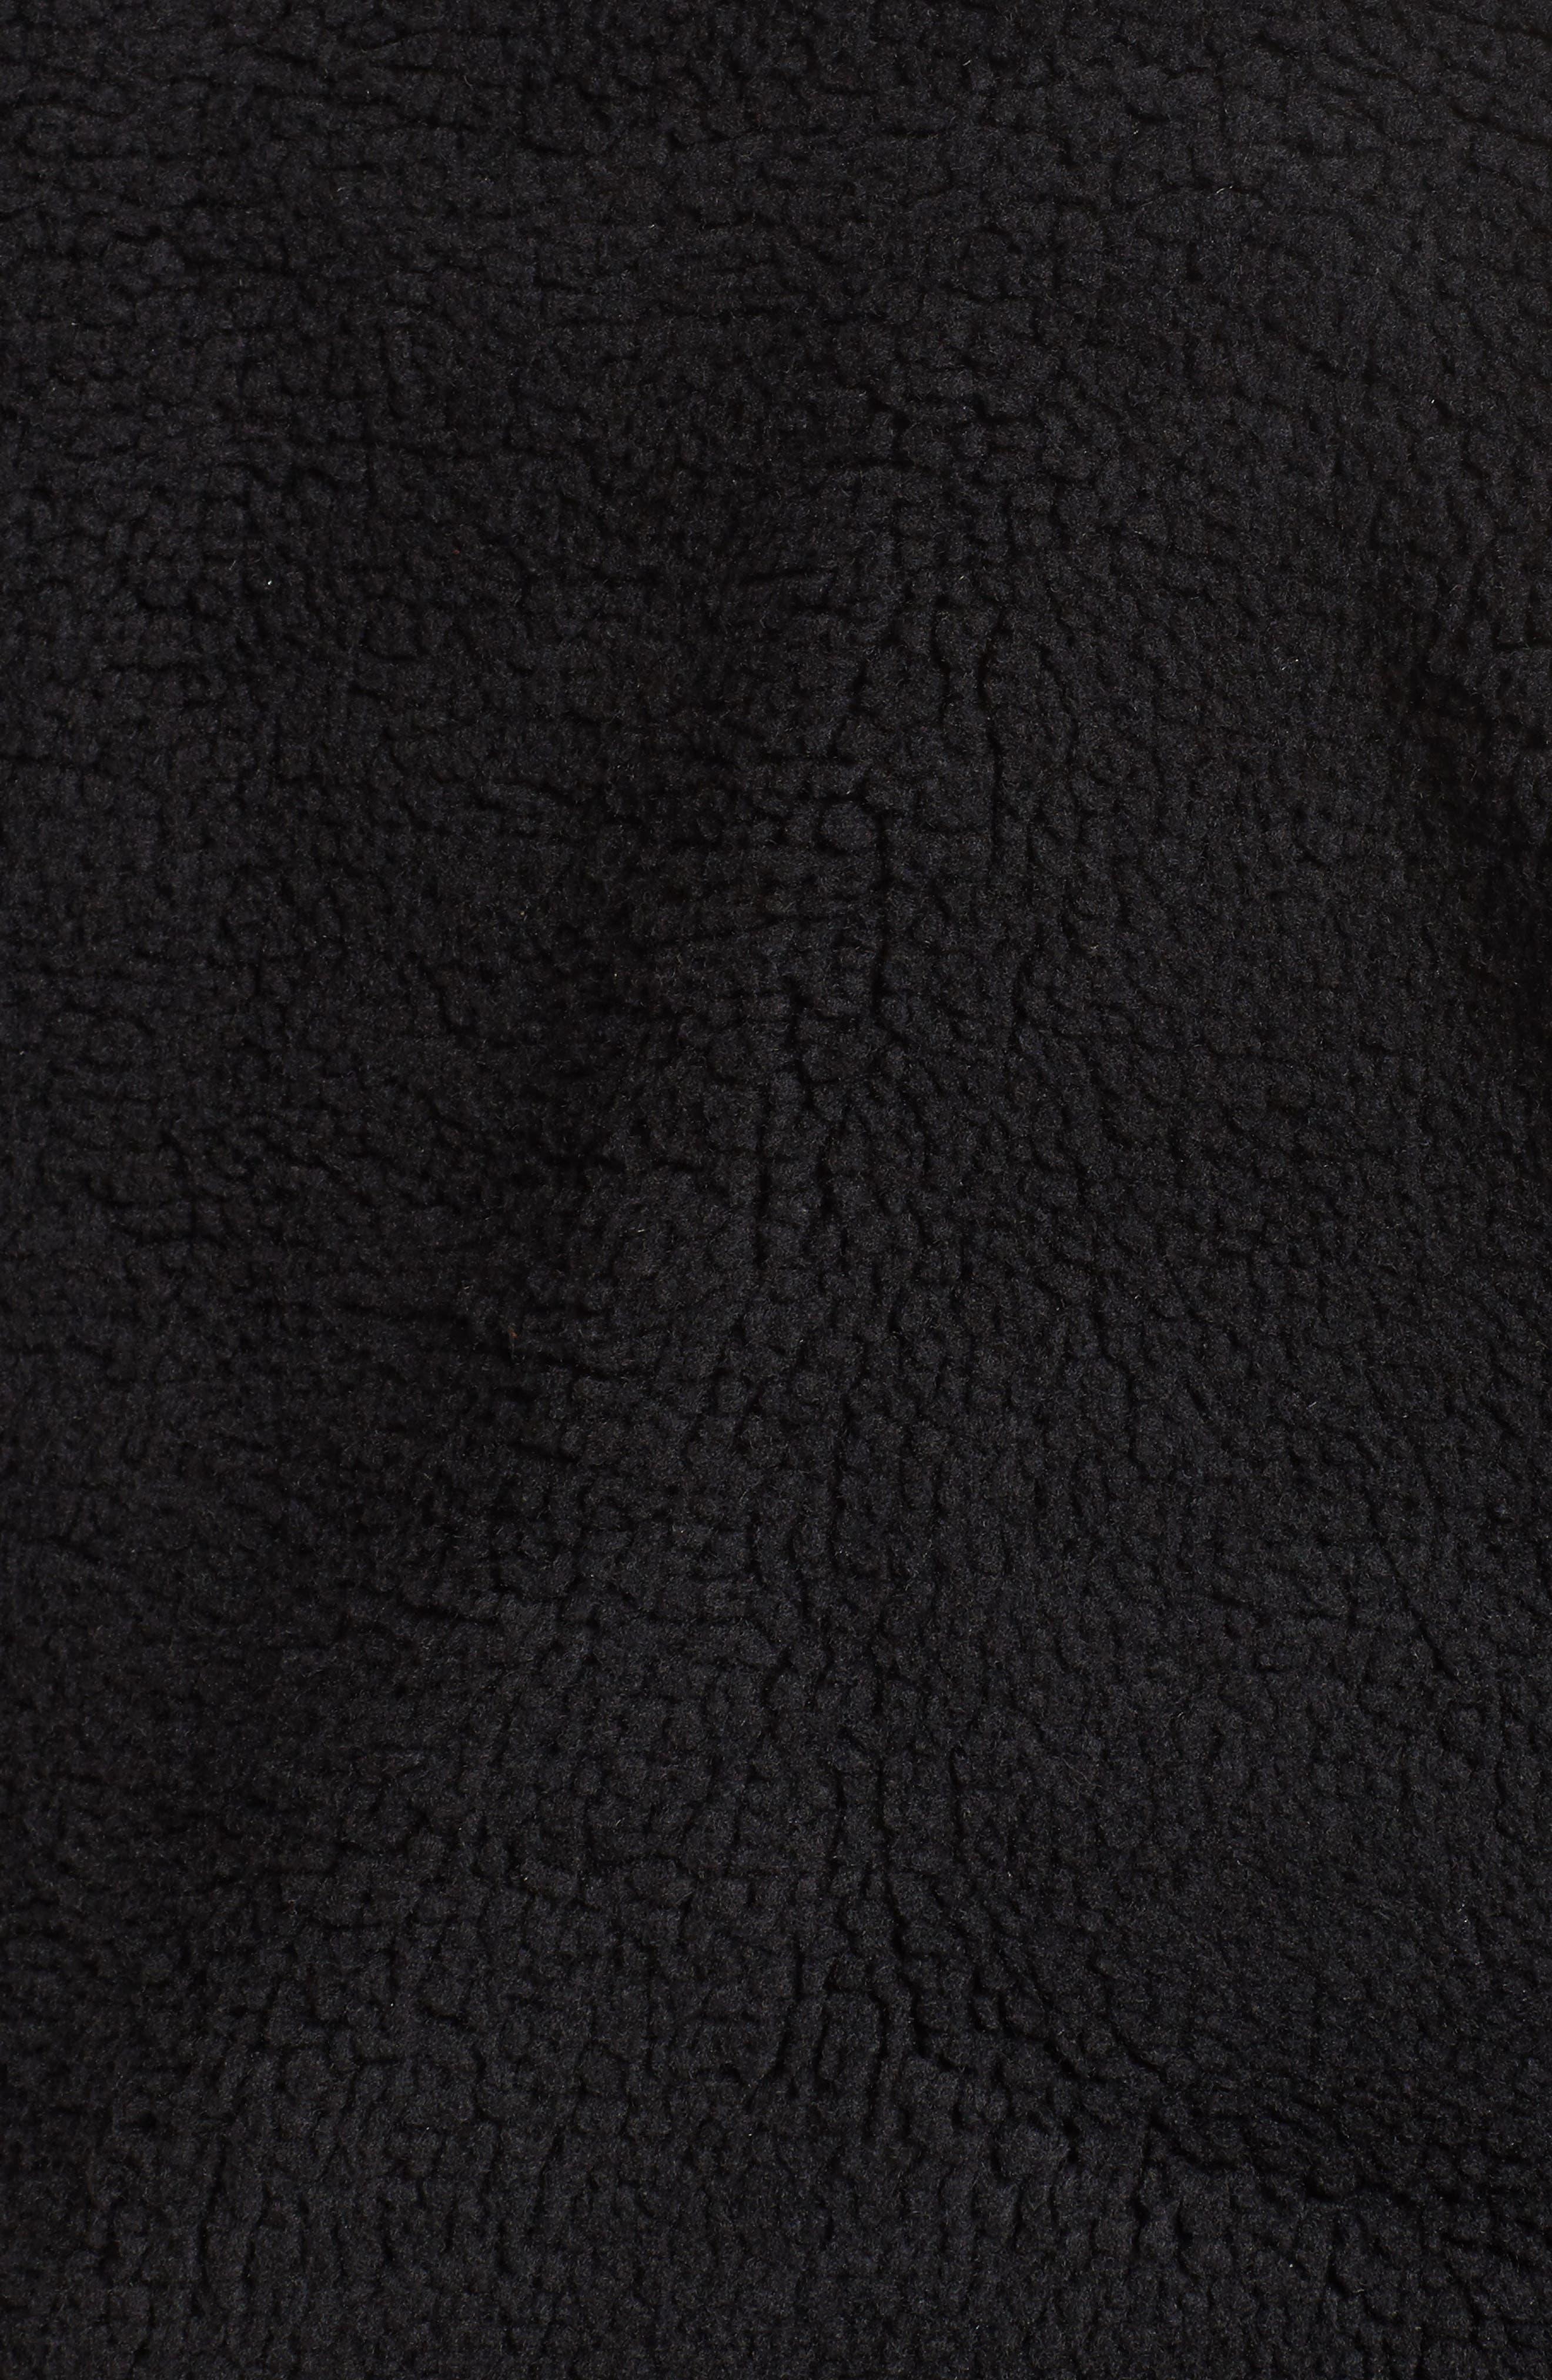 Rib Knit Fleece Bomber Jacket,                             Alternate thumbnail 5, color,                             Black